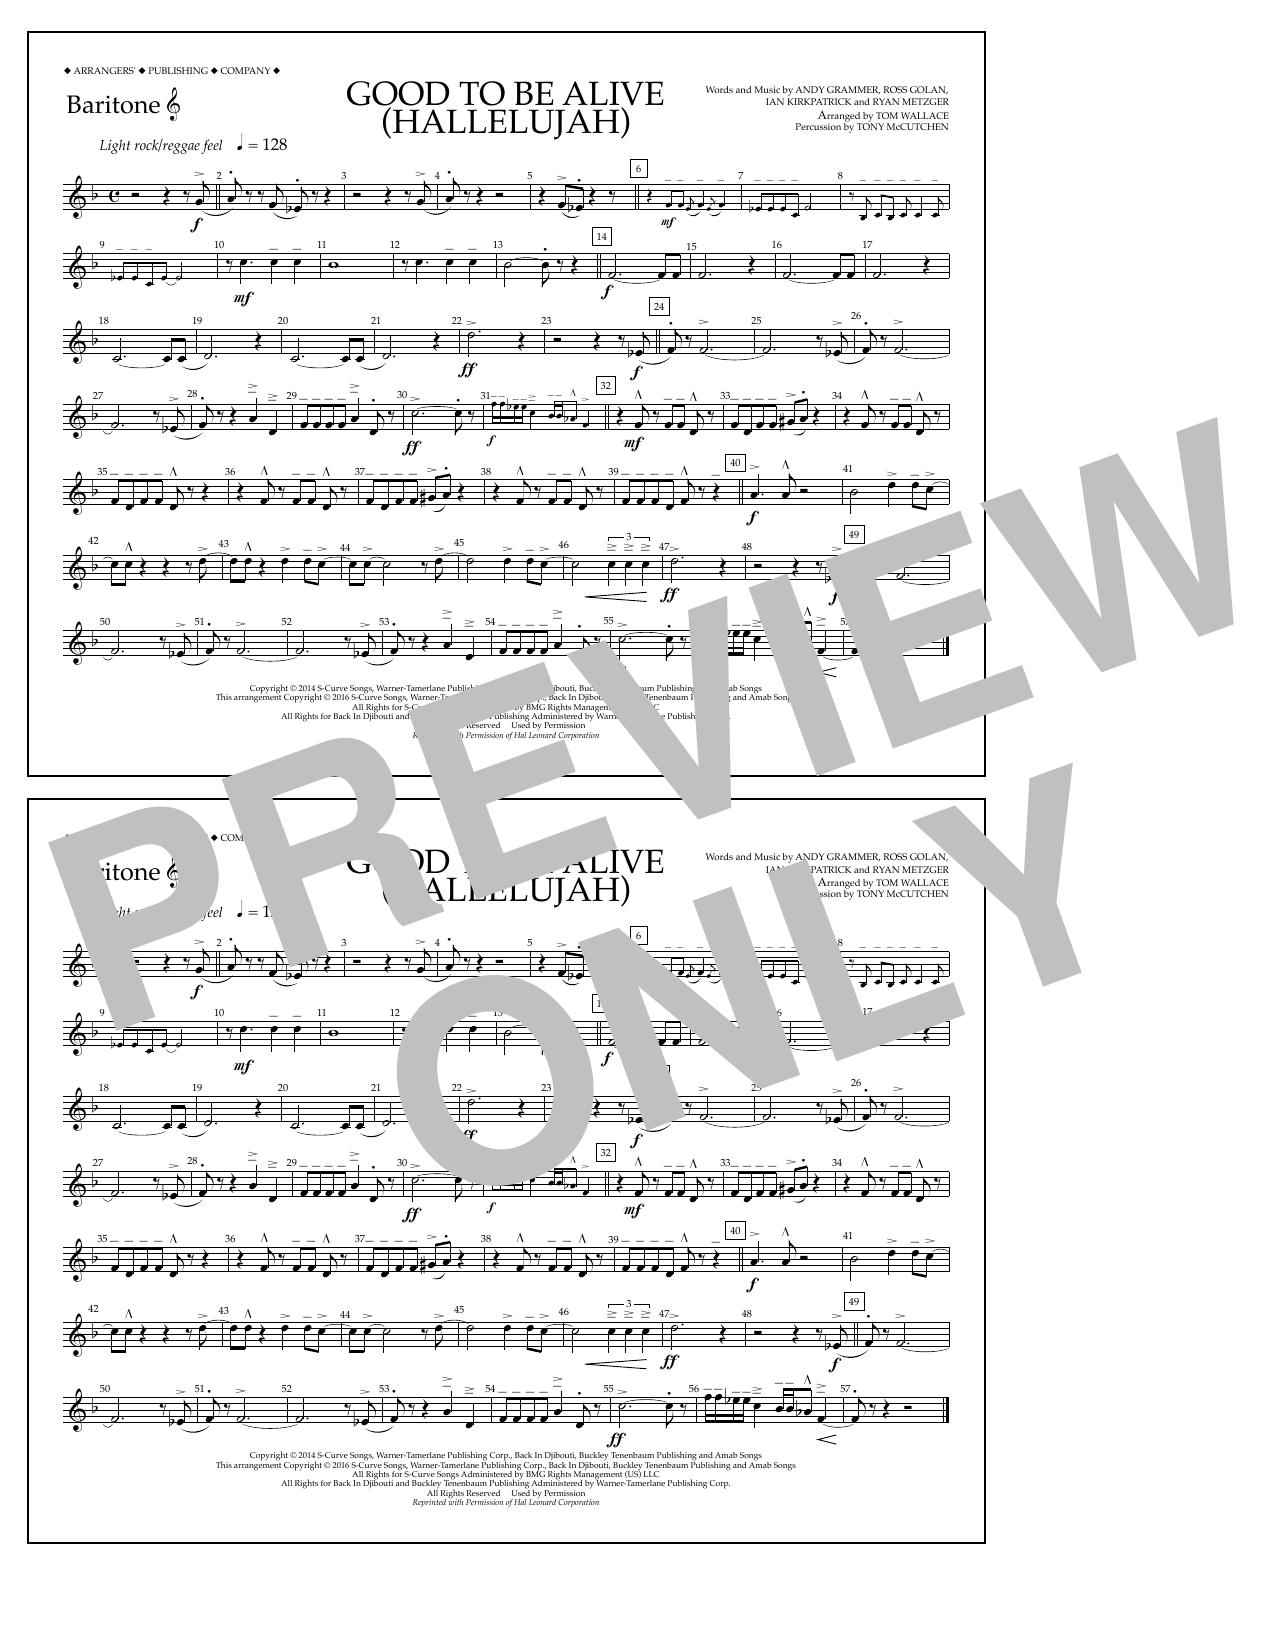 Good to Be Alive (Hallelujah) - Baritone T.C. Sheet Music